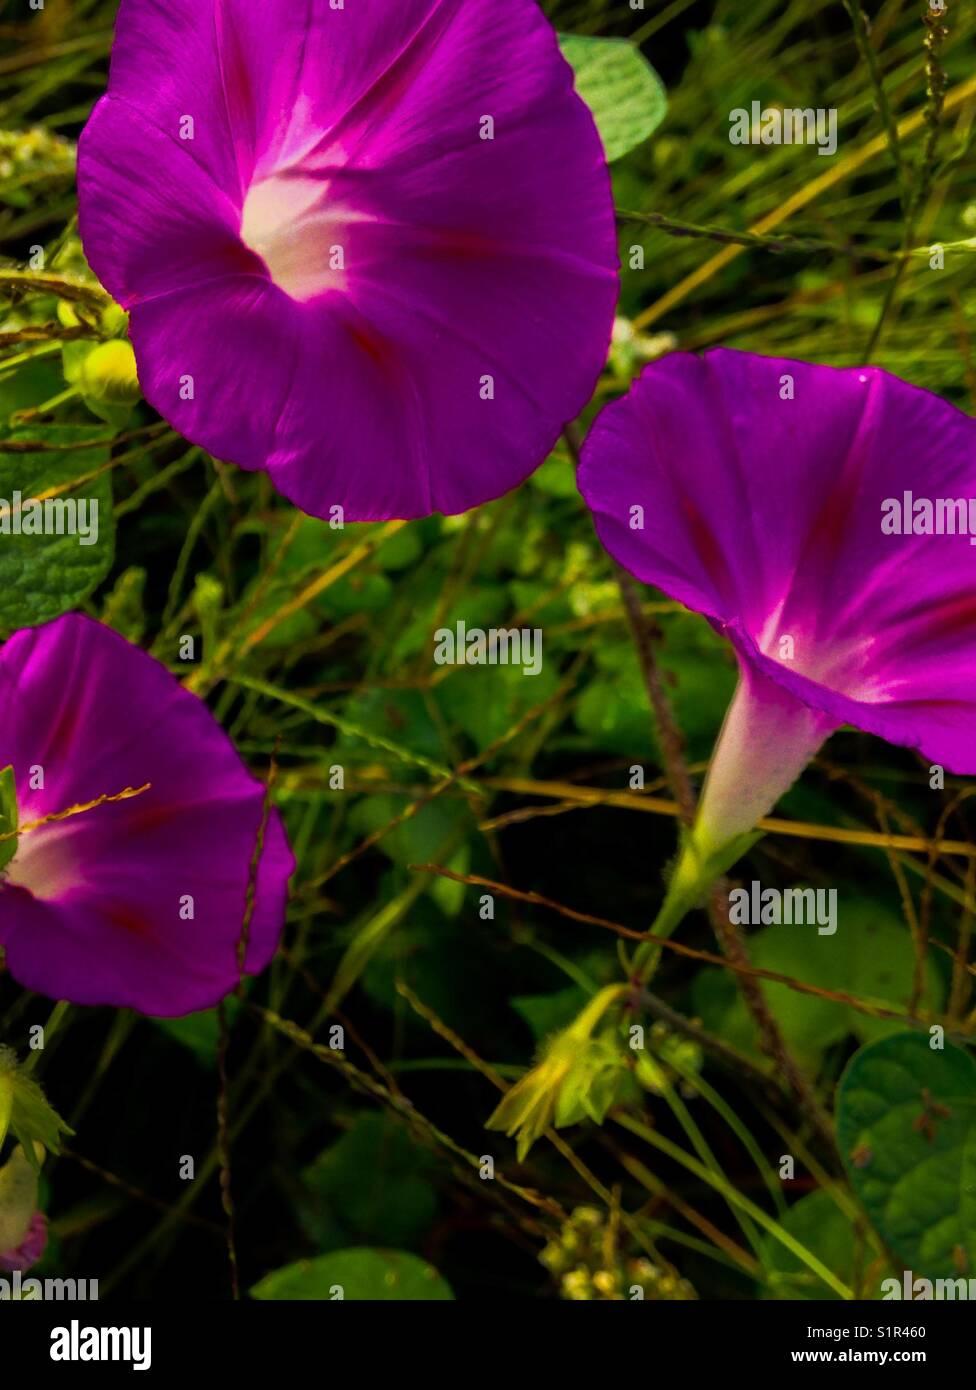 Pink morning glories in morning sun - Stock Image